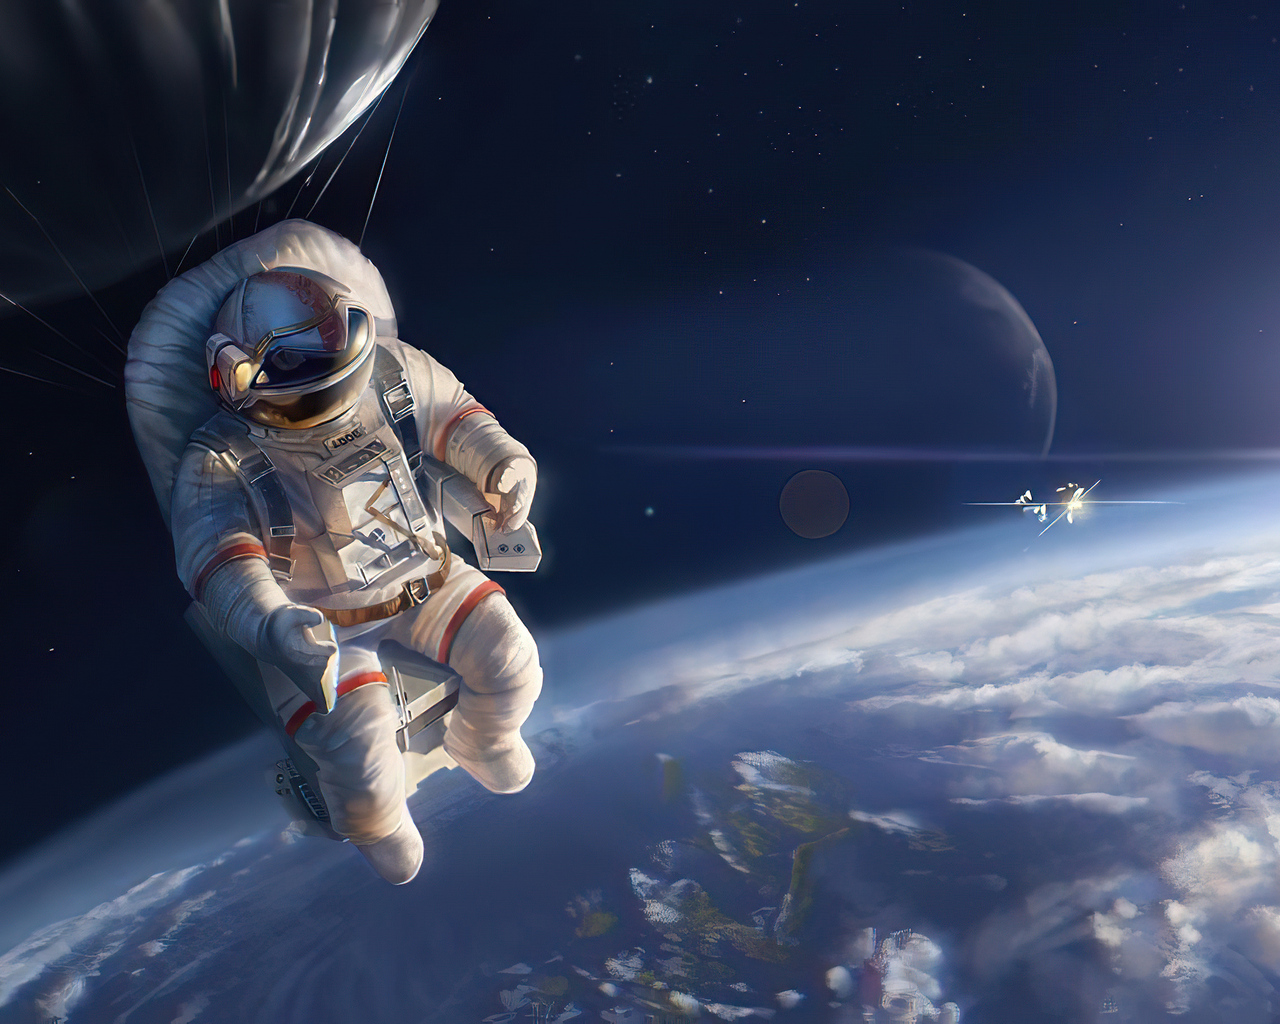 the-ascention-astronaut-4k-8w.jpg